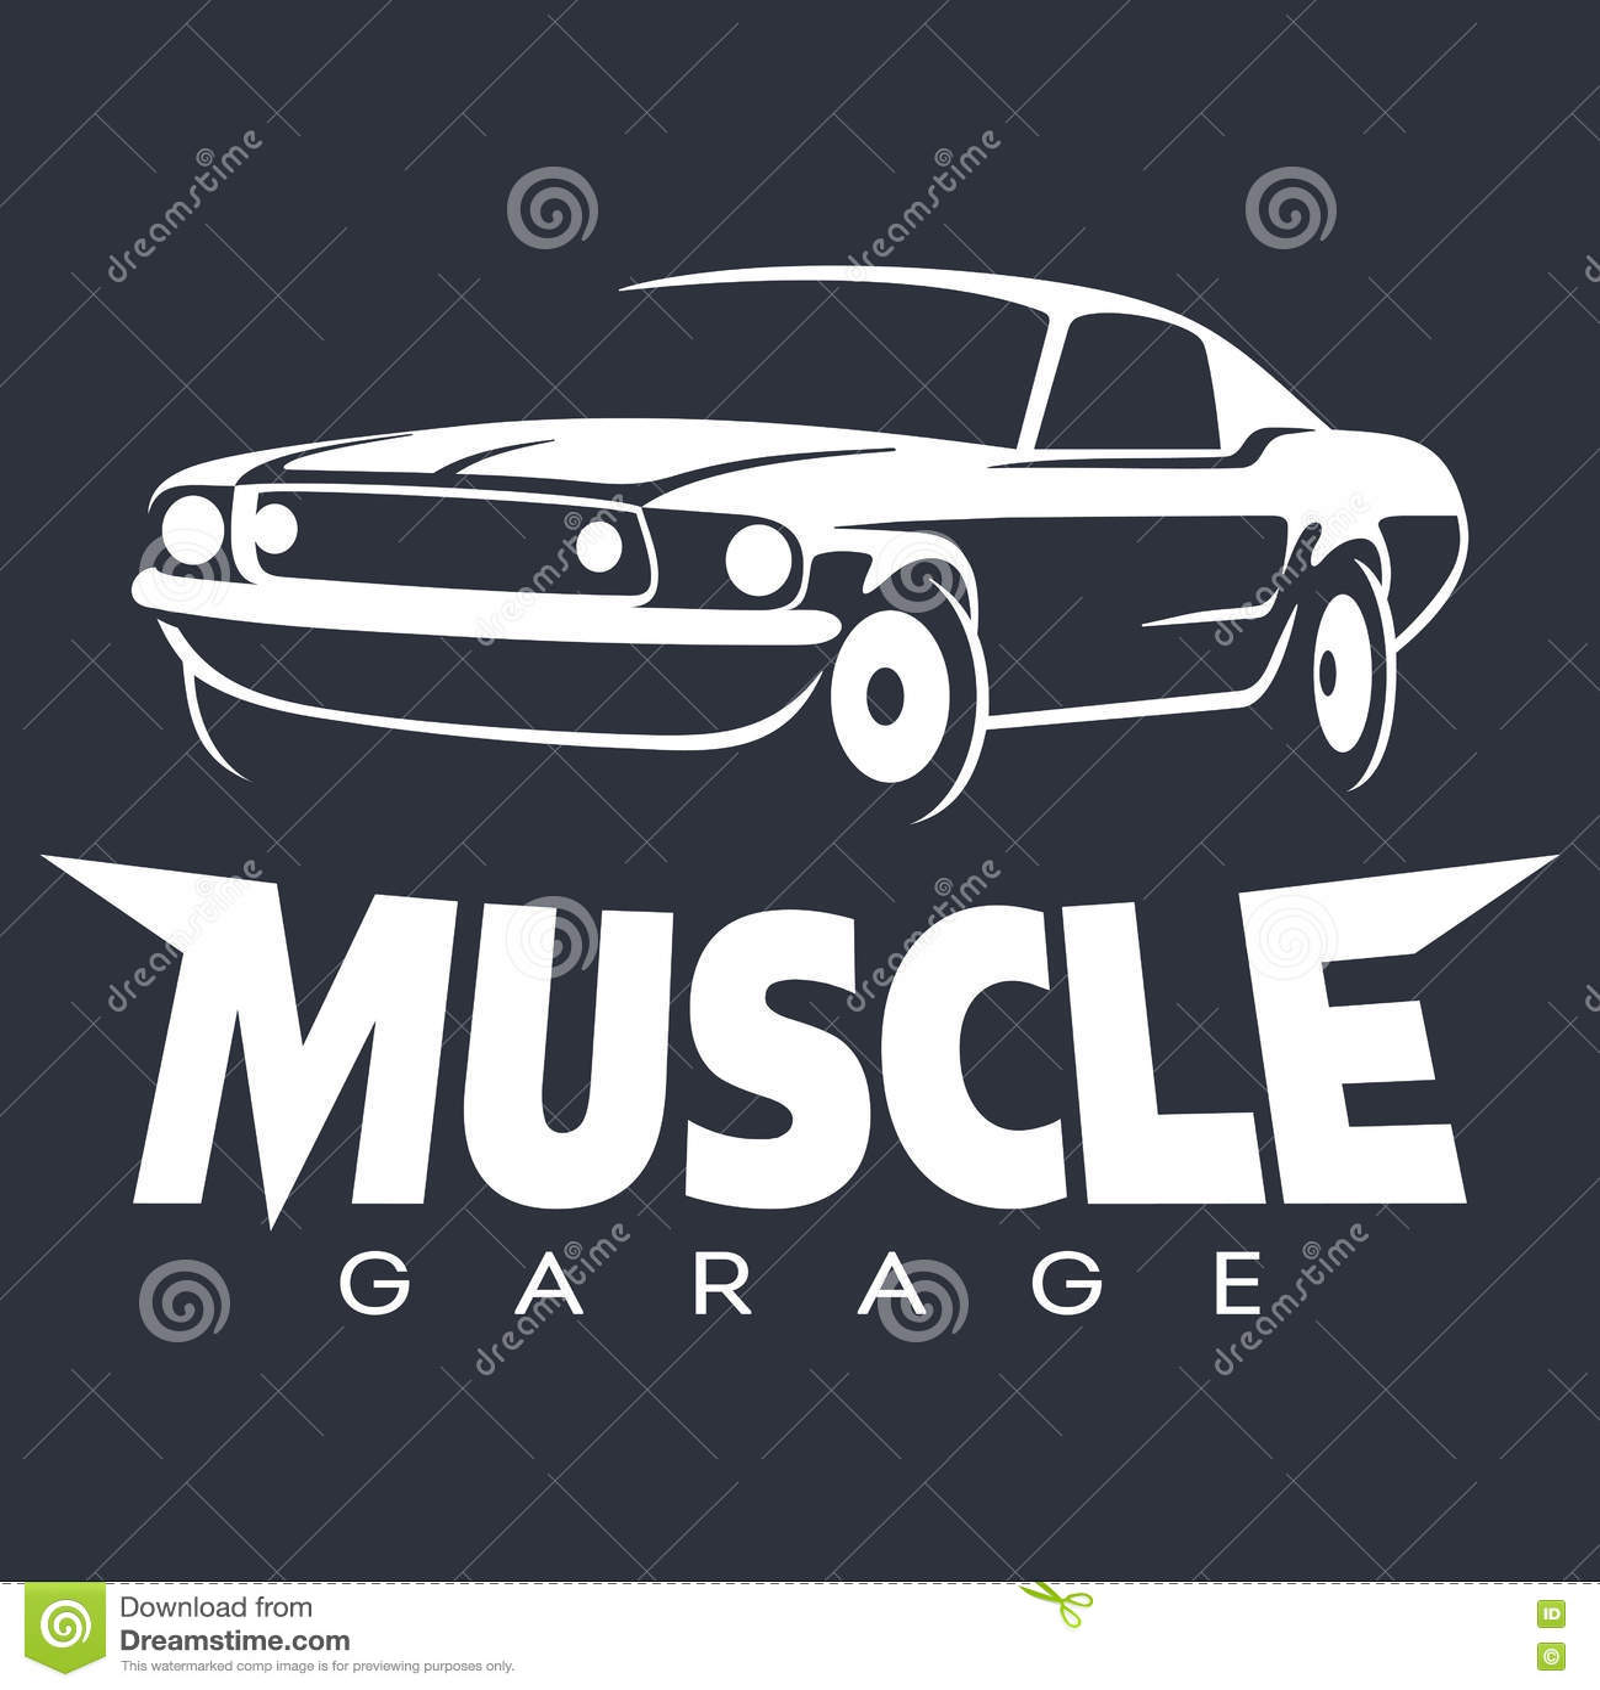 Muscle Car Garage Logo White Stock Vector Illustration Of